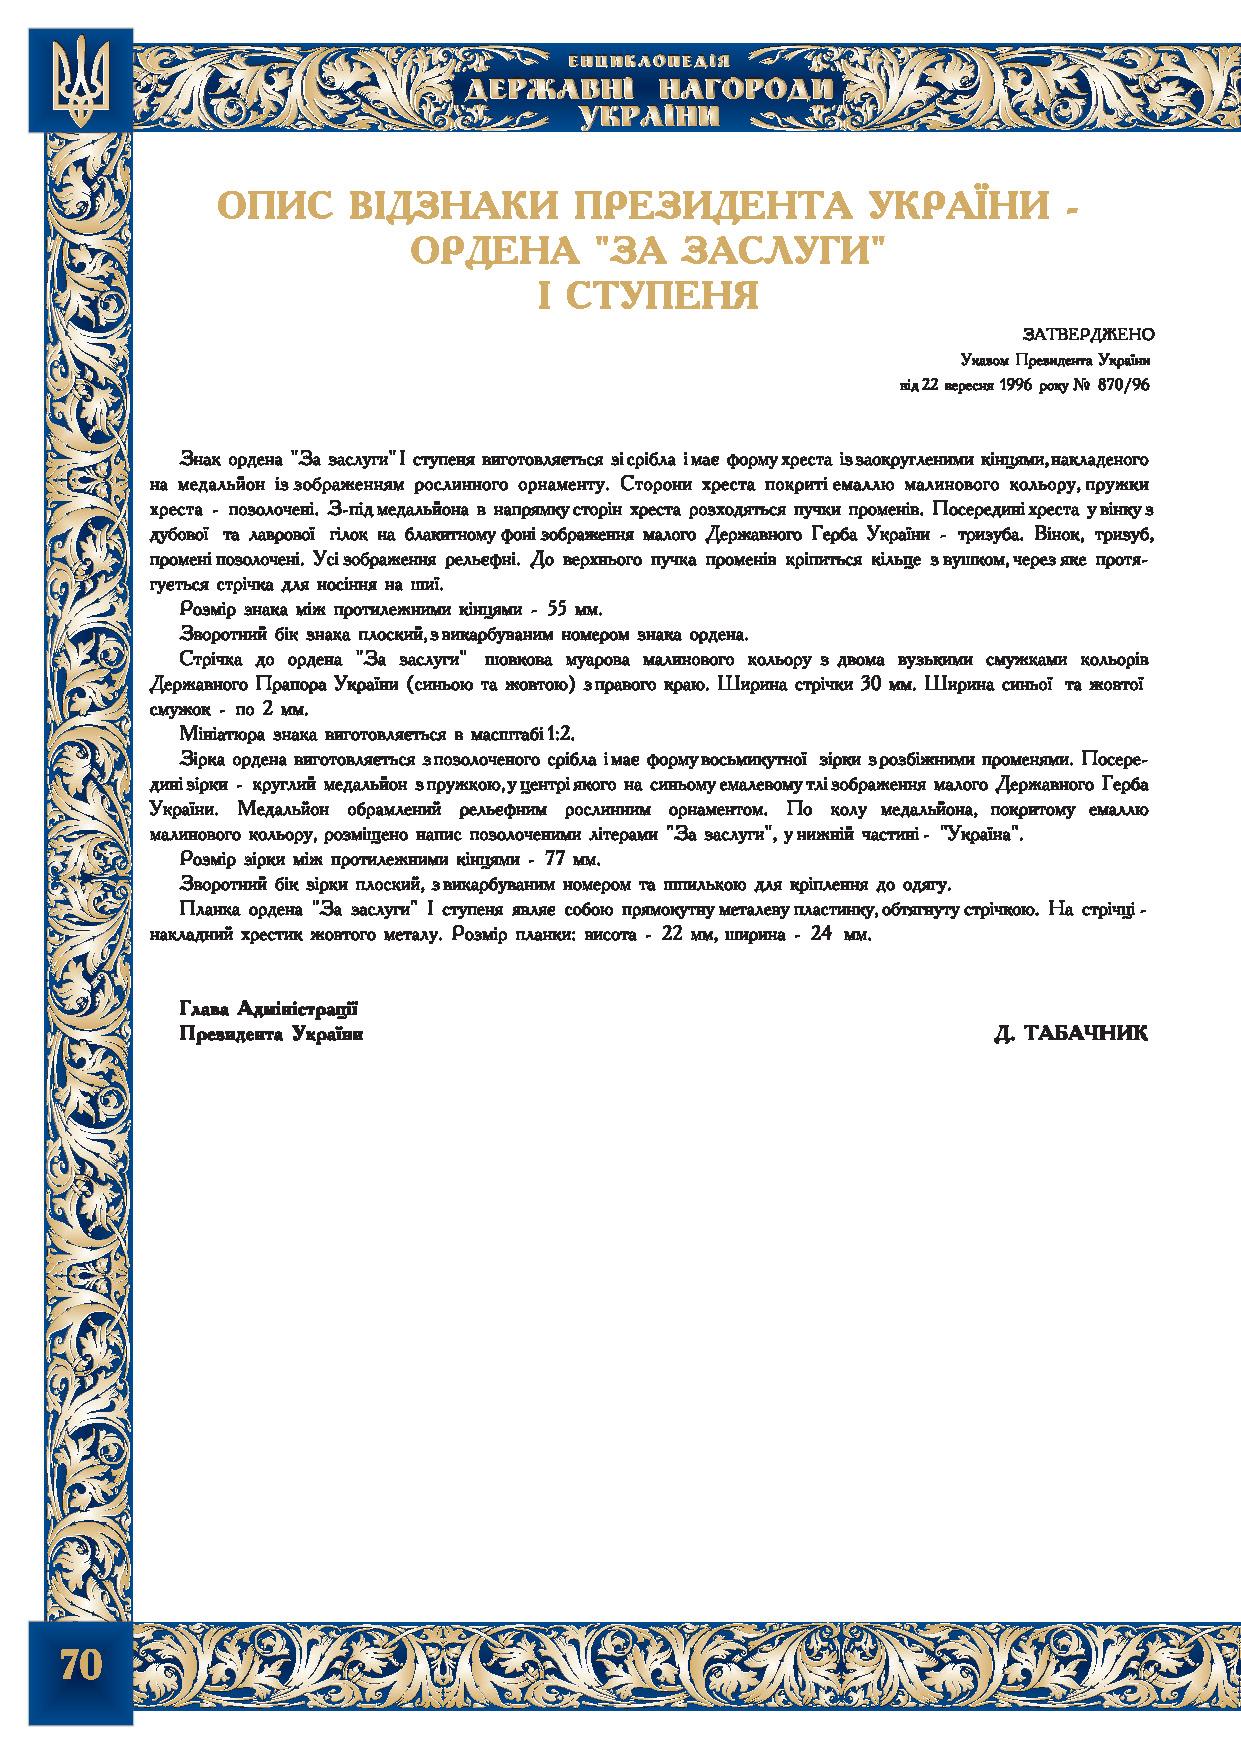 Опис відзнаки Президента України - ордена